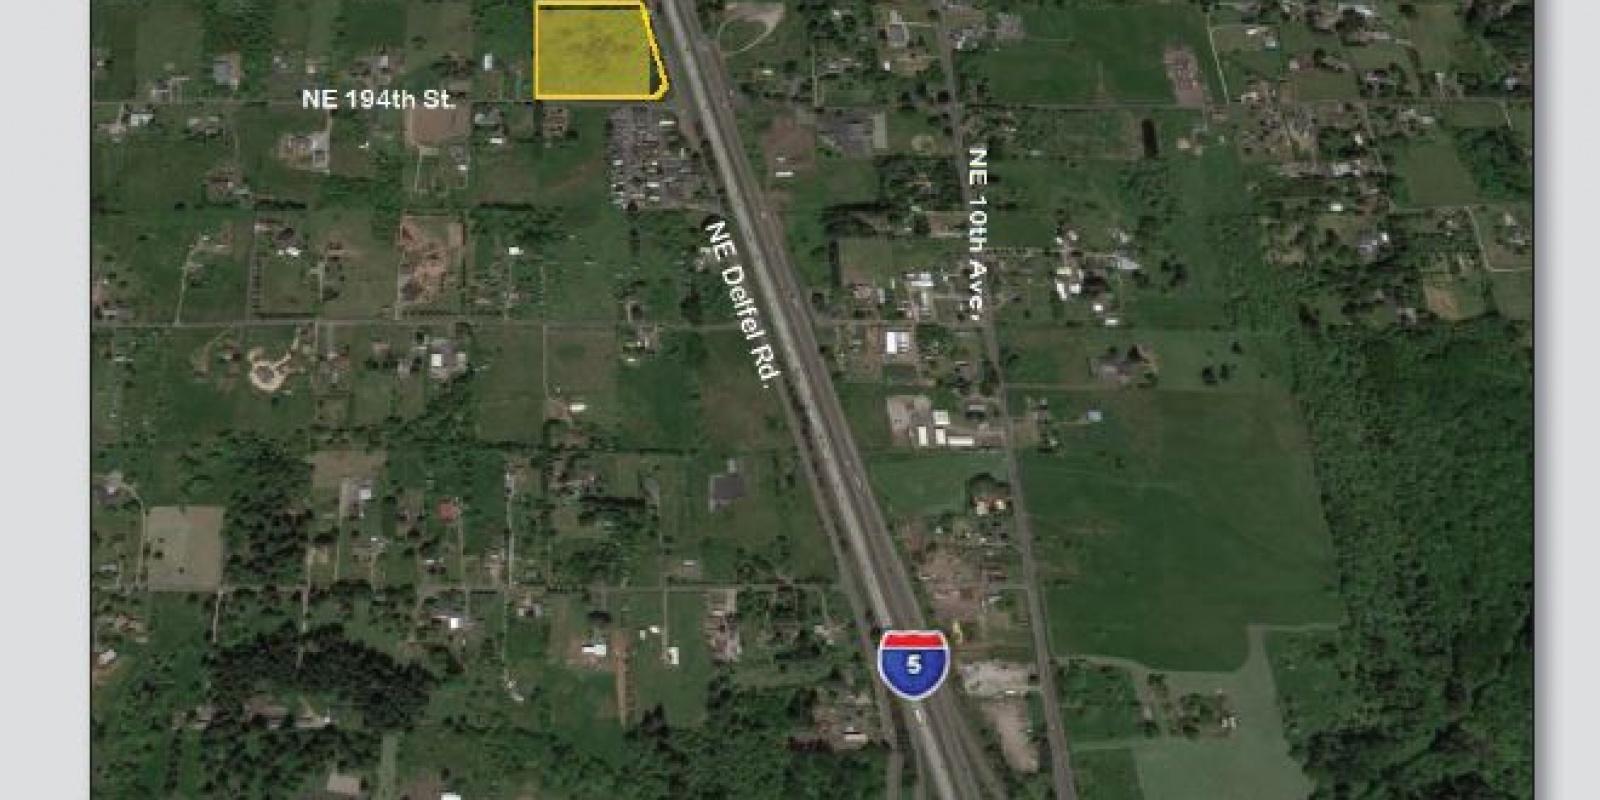 NE Delfel Rd. & NE 194th St. Ridgefield, WA, ,Land,For Sale,NE Delfel Rd. & NE 194th St. Ridgefield, WA ,1427